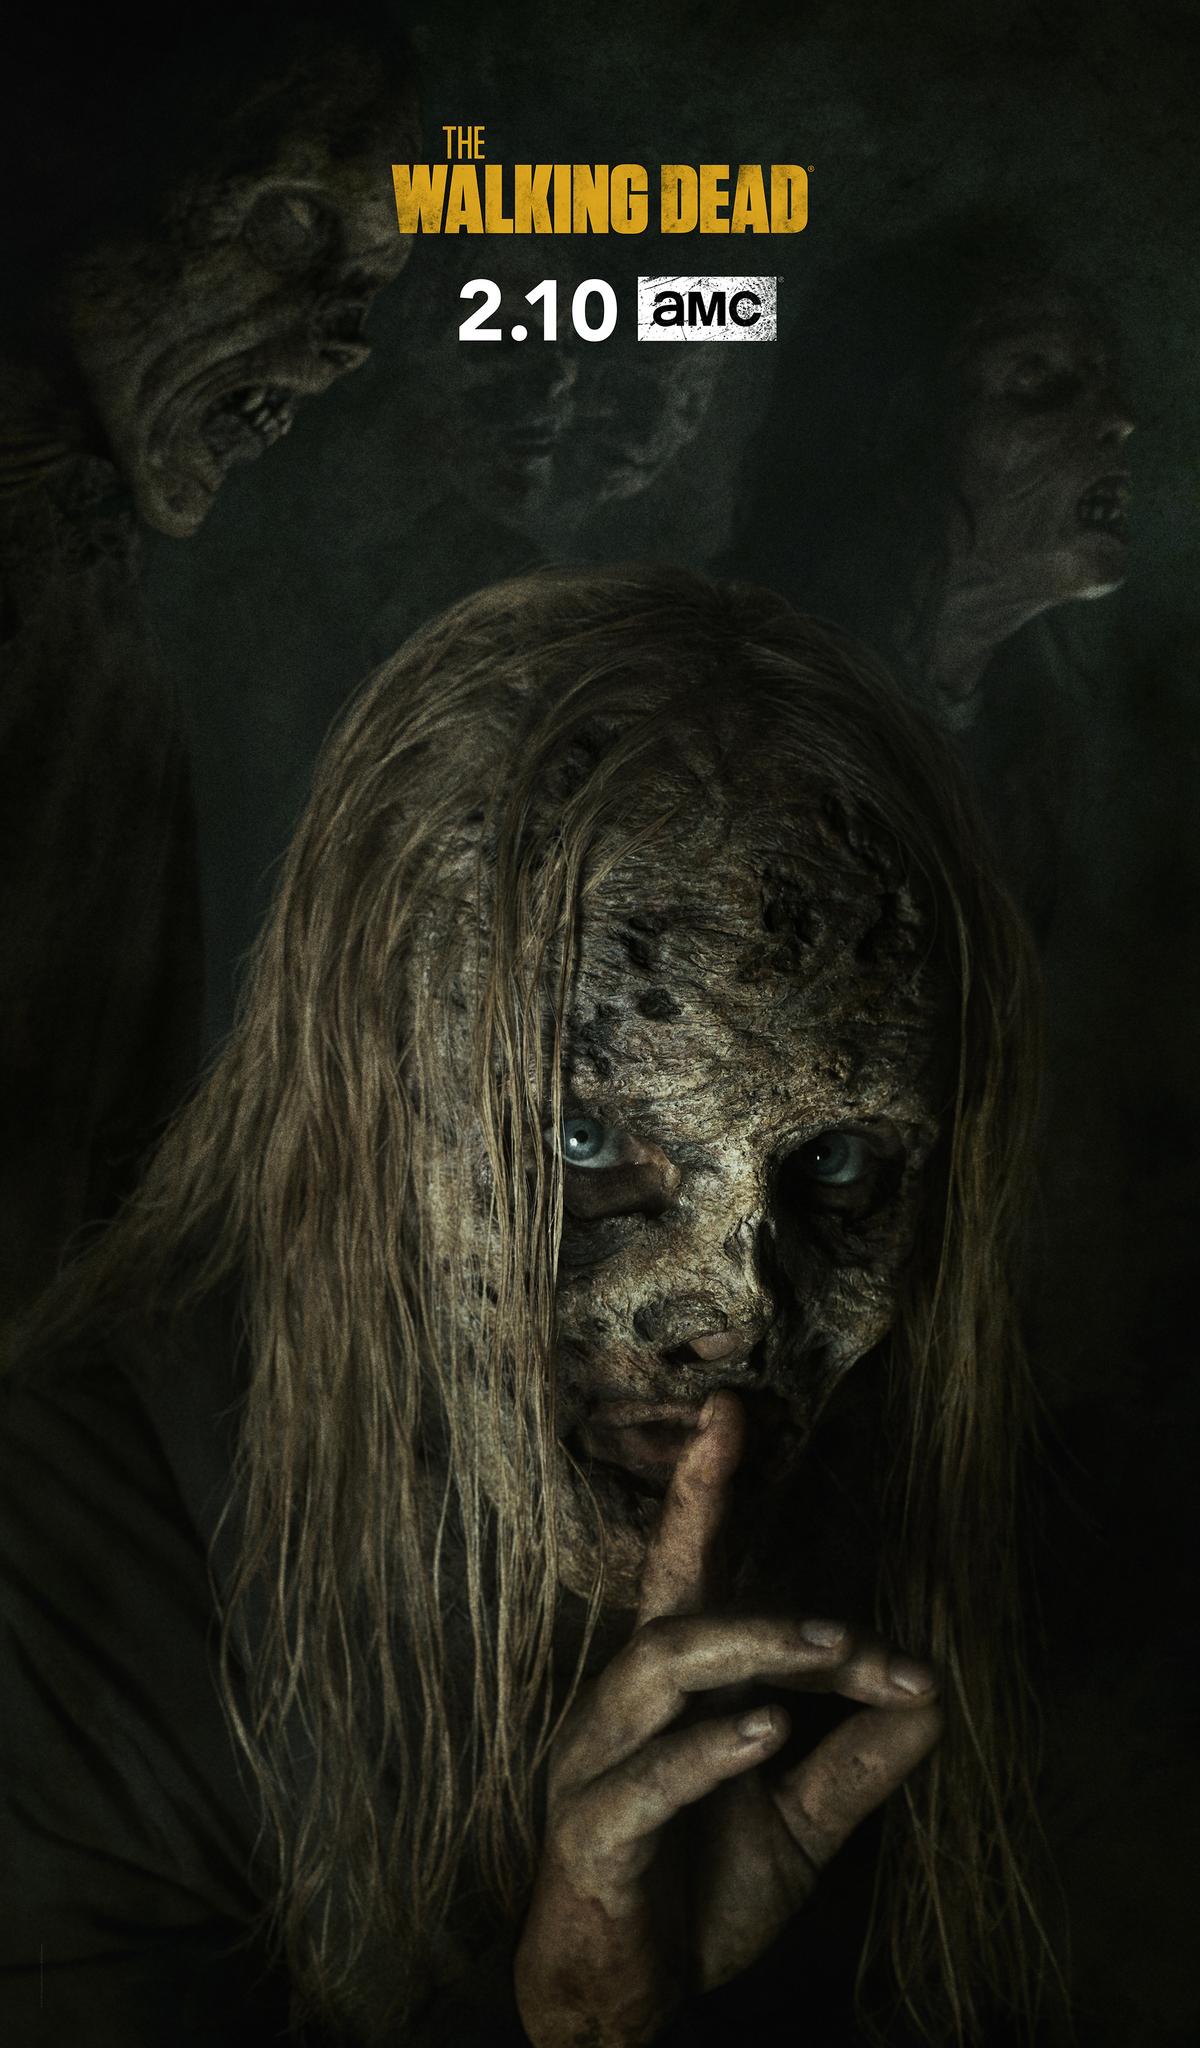 The Walking Dead Season 9 COMPLETE WEBRip 480p, 720p & 1080p